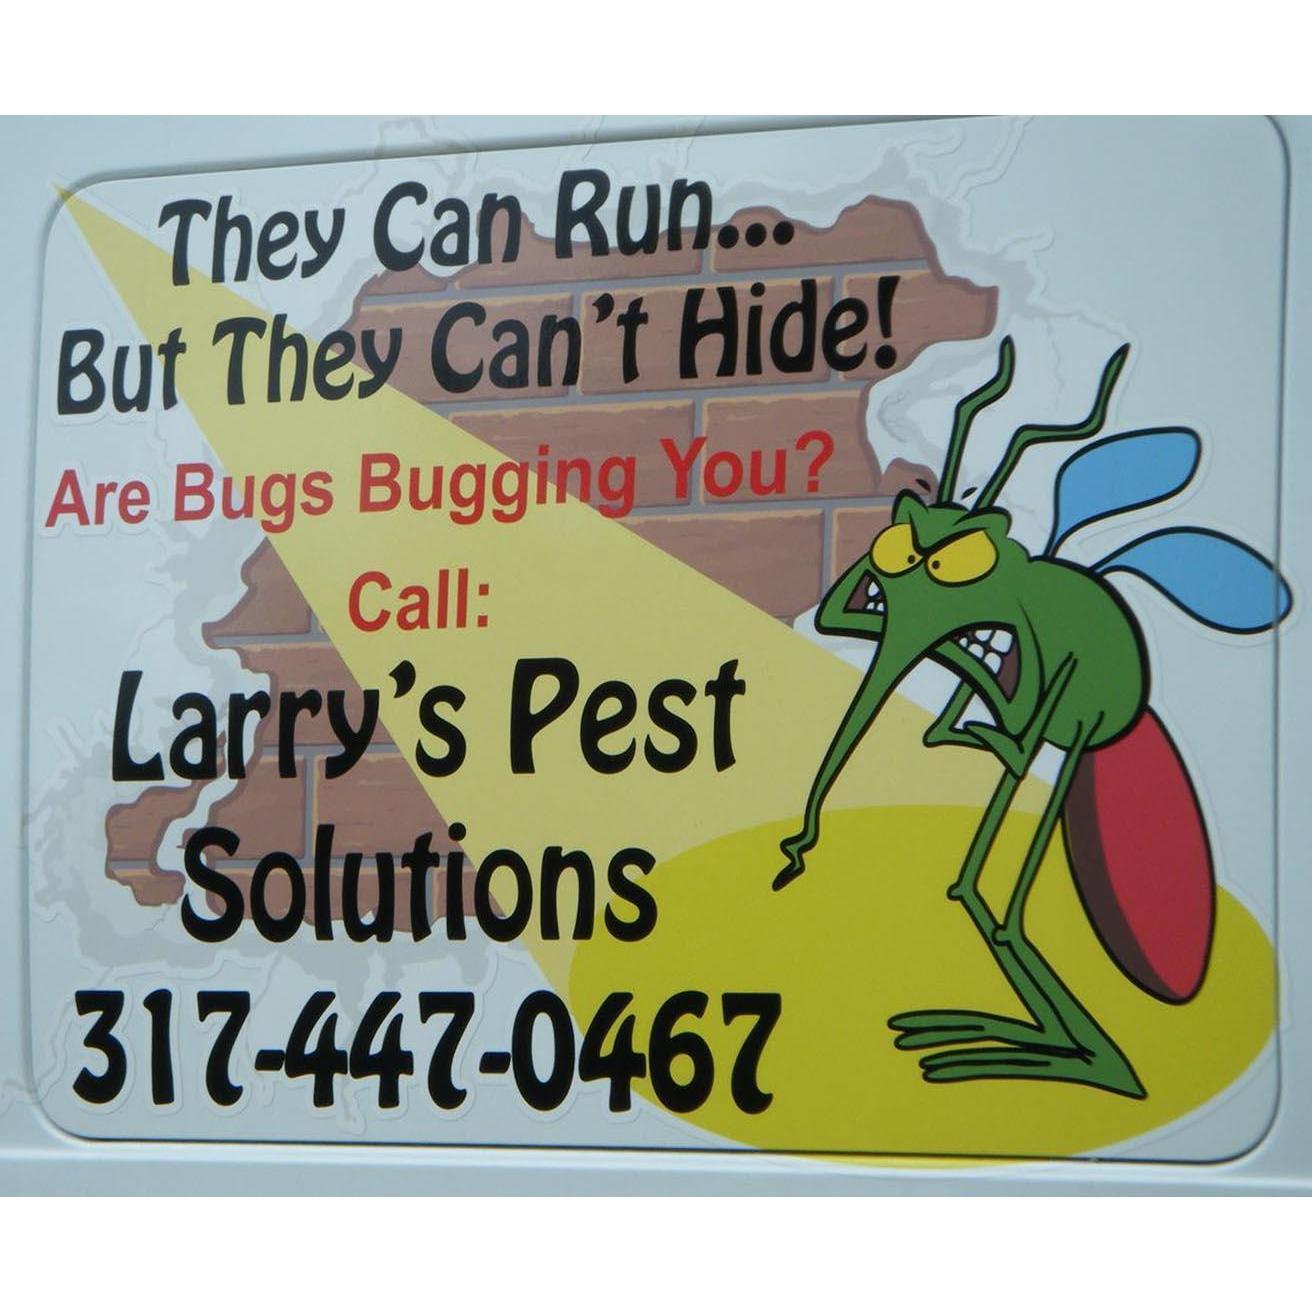 Larry's Pest Solutions